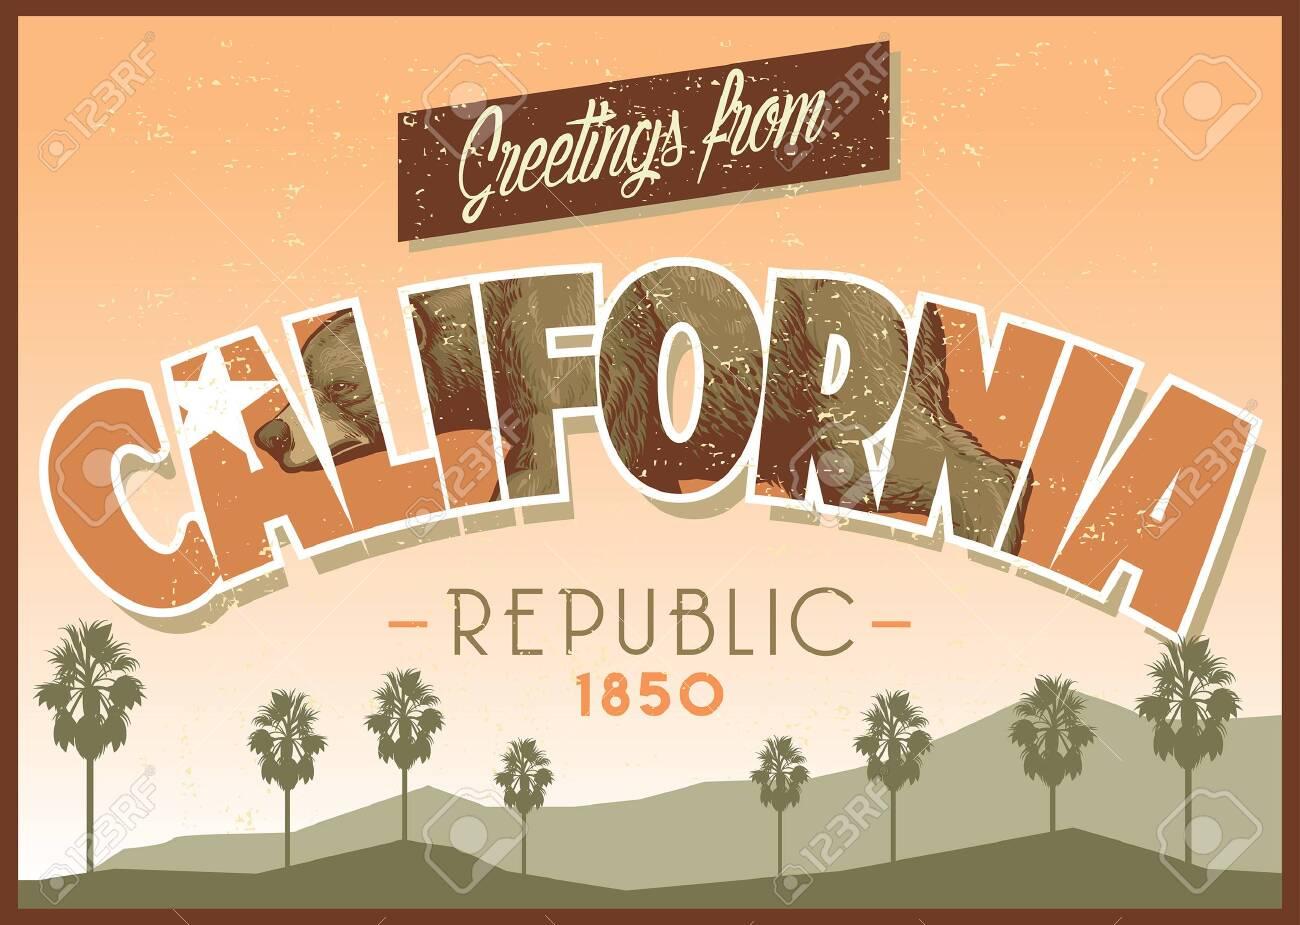 california greeting design - 126488570